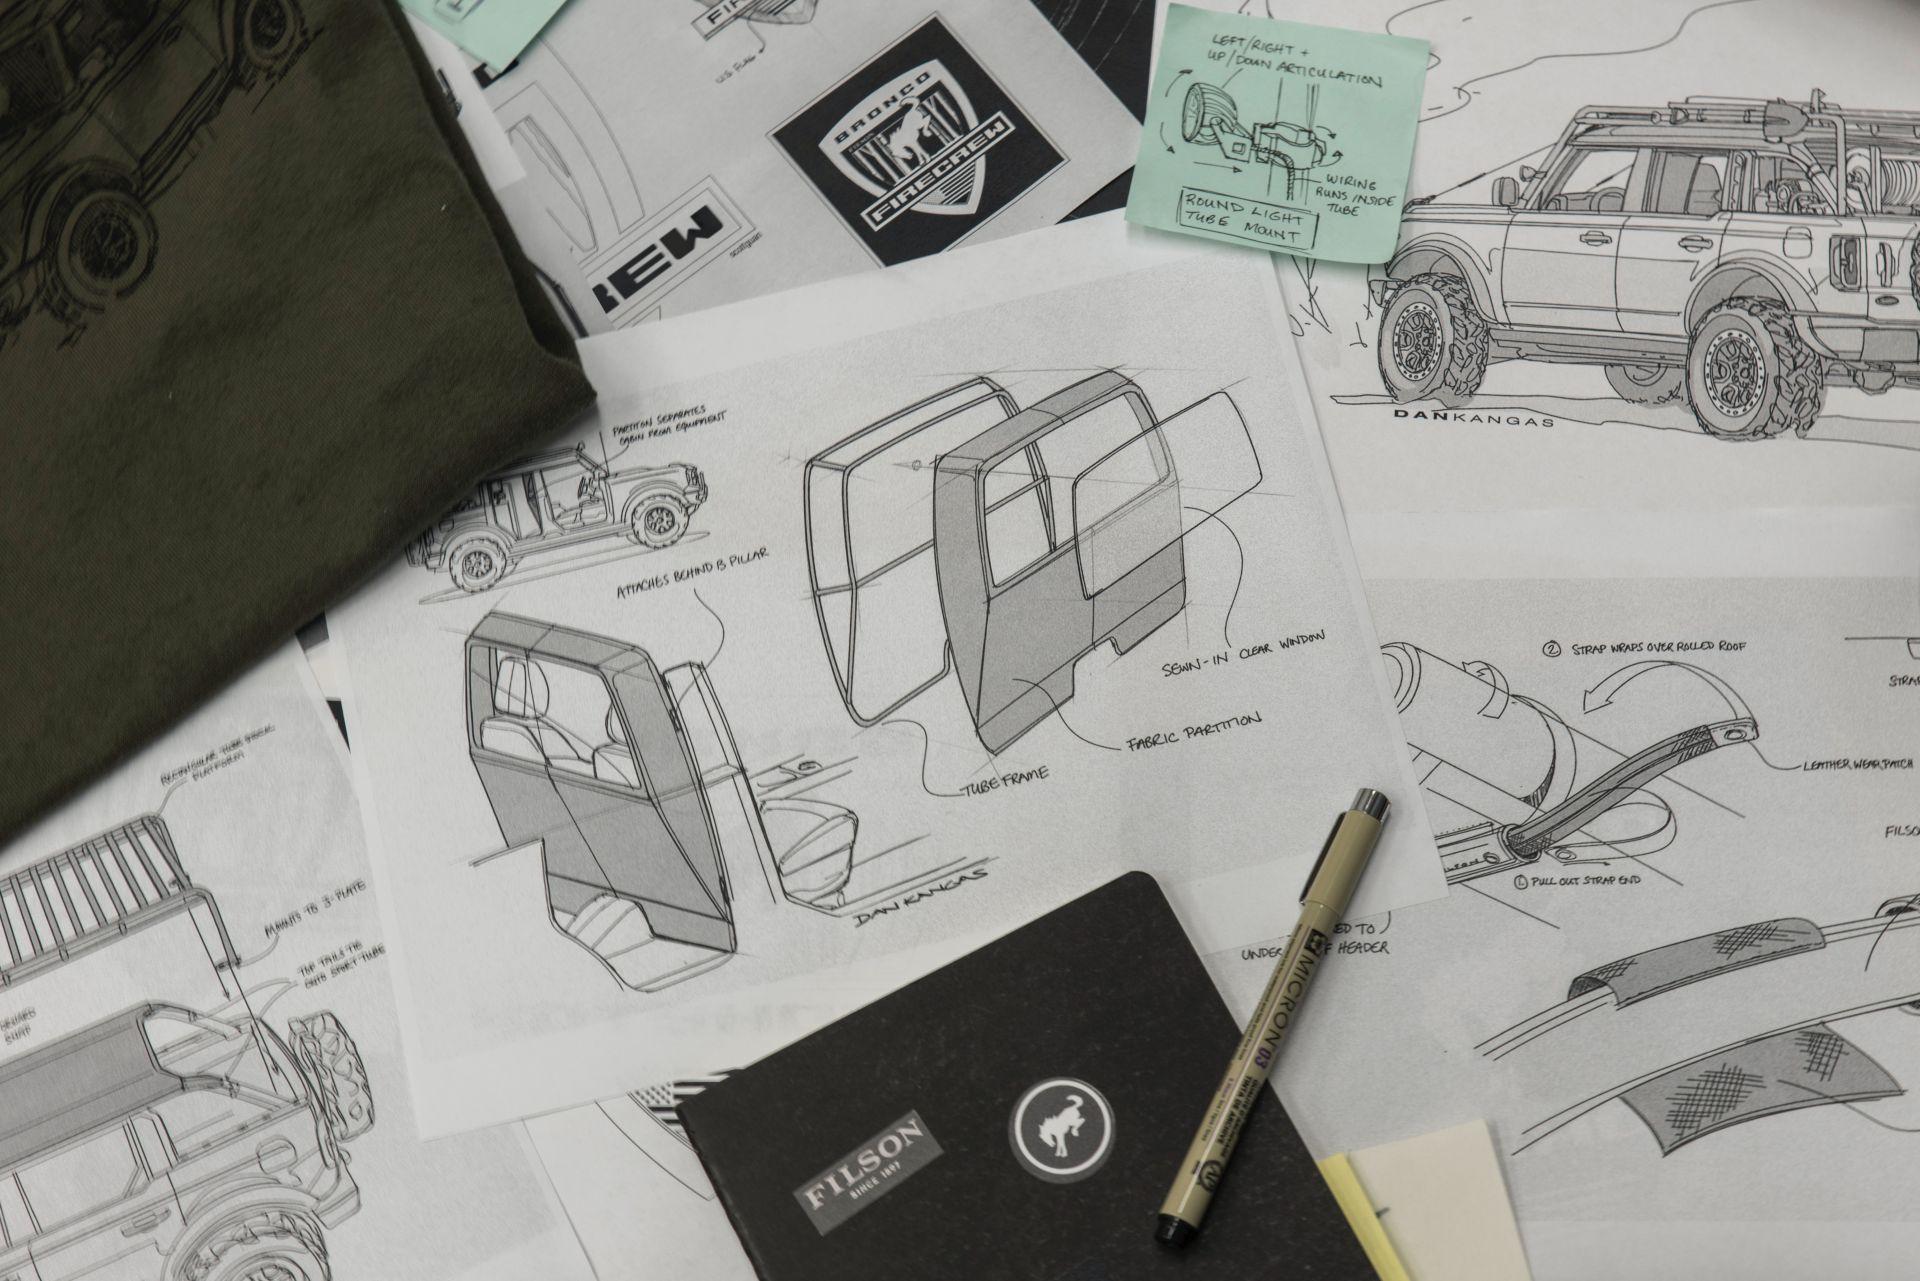 Ford-Bronco-Wildland-Fire-Rig-Concept-13